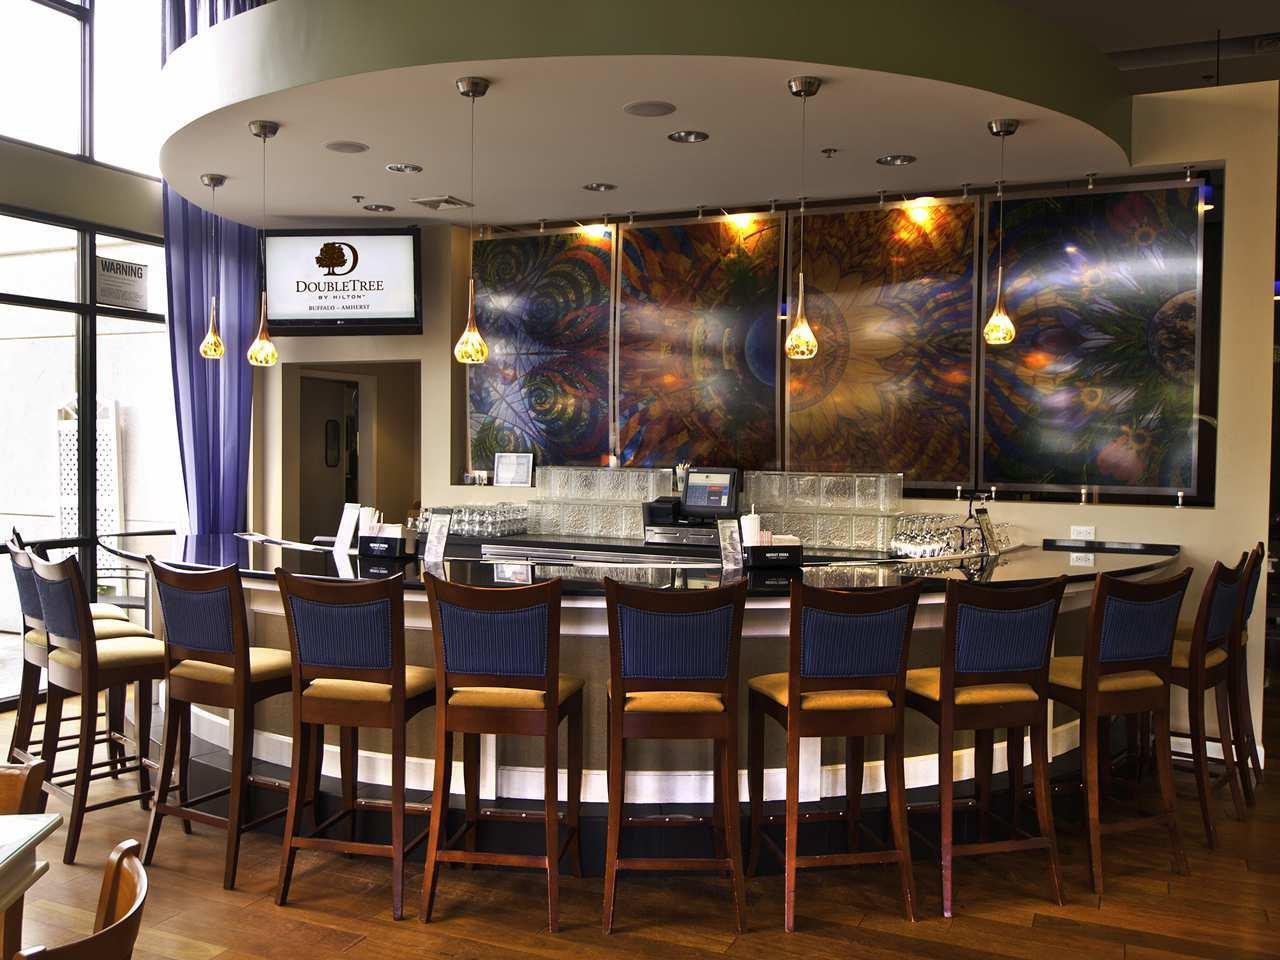 DoubleTree by Hilton Hotel Buffalo - Amherst image 1